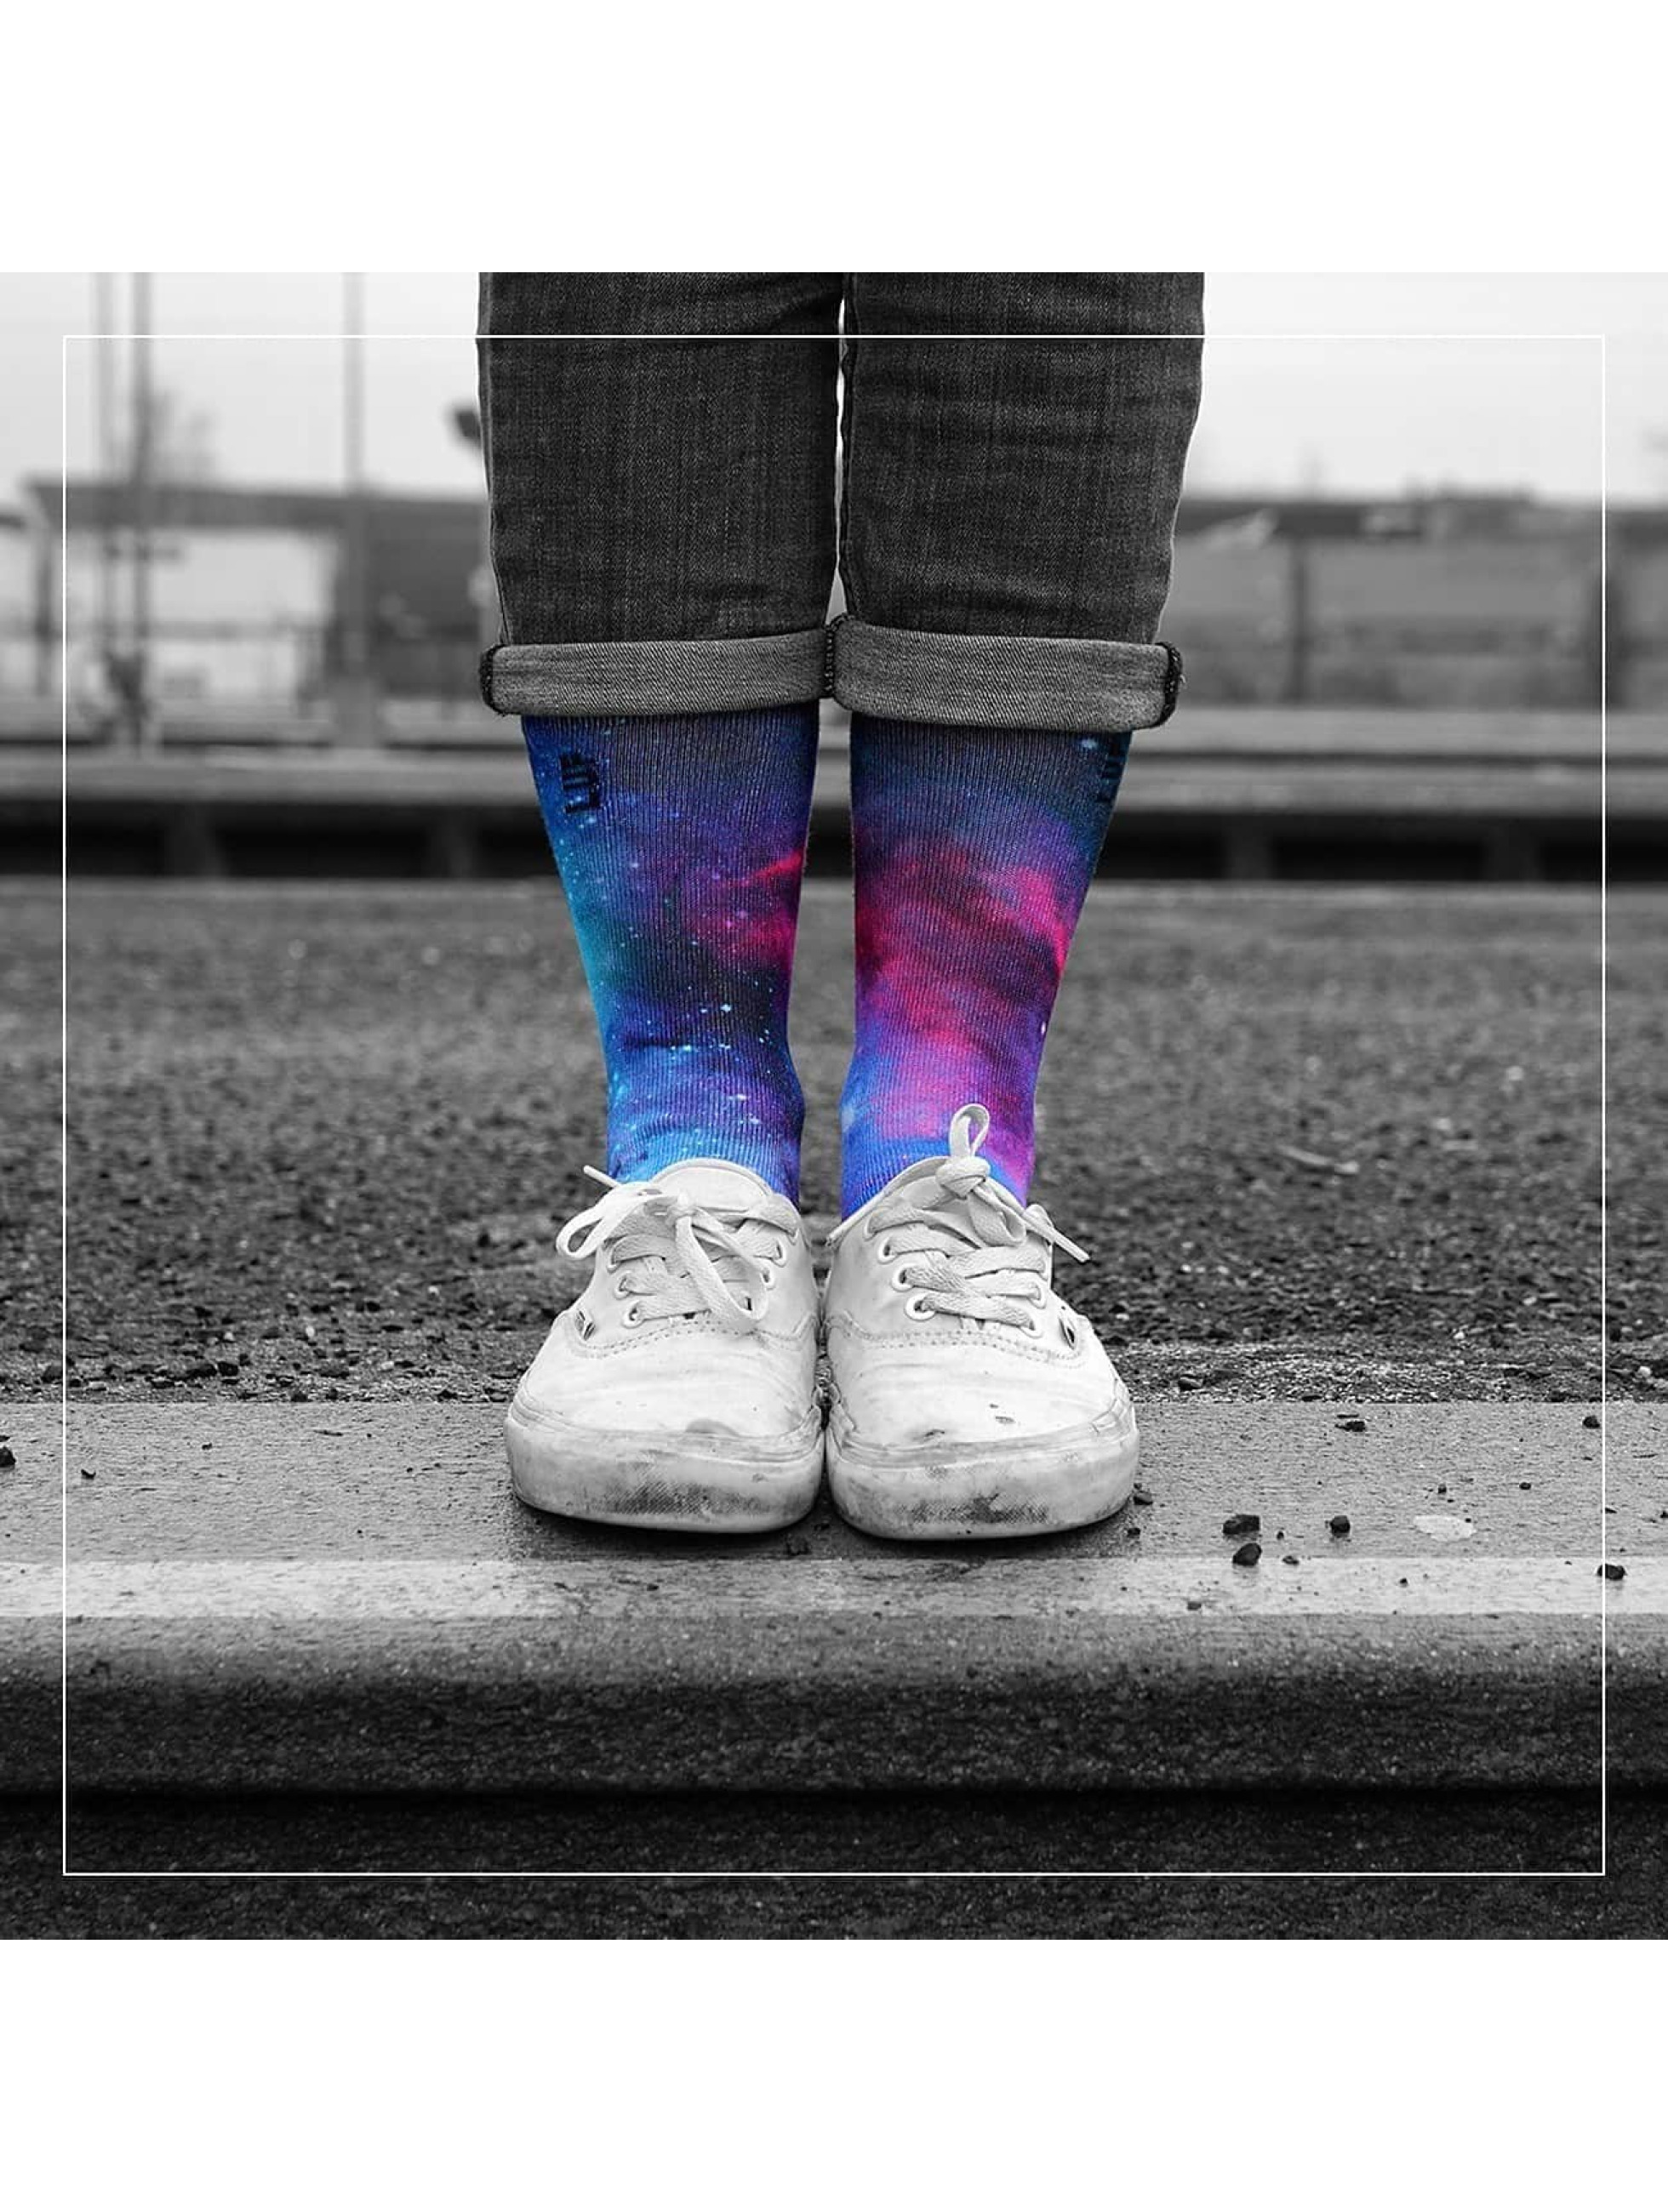 LUF SOX Chaussettes LS051001 multicolore